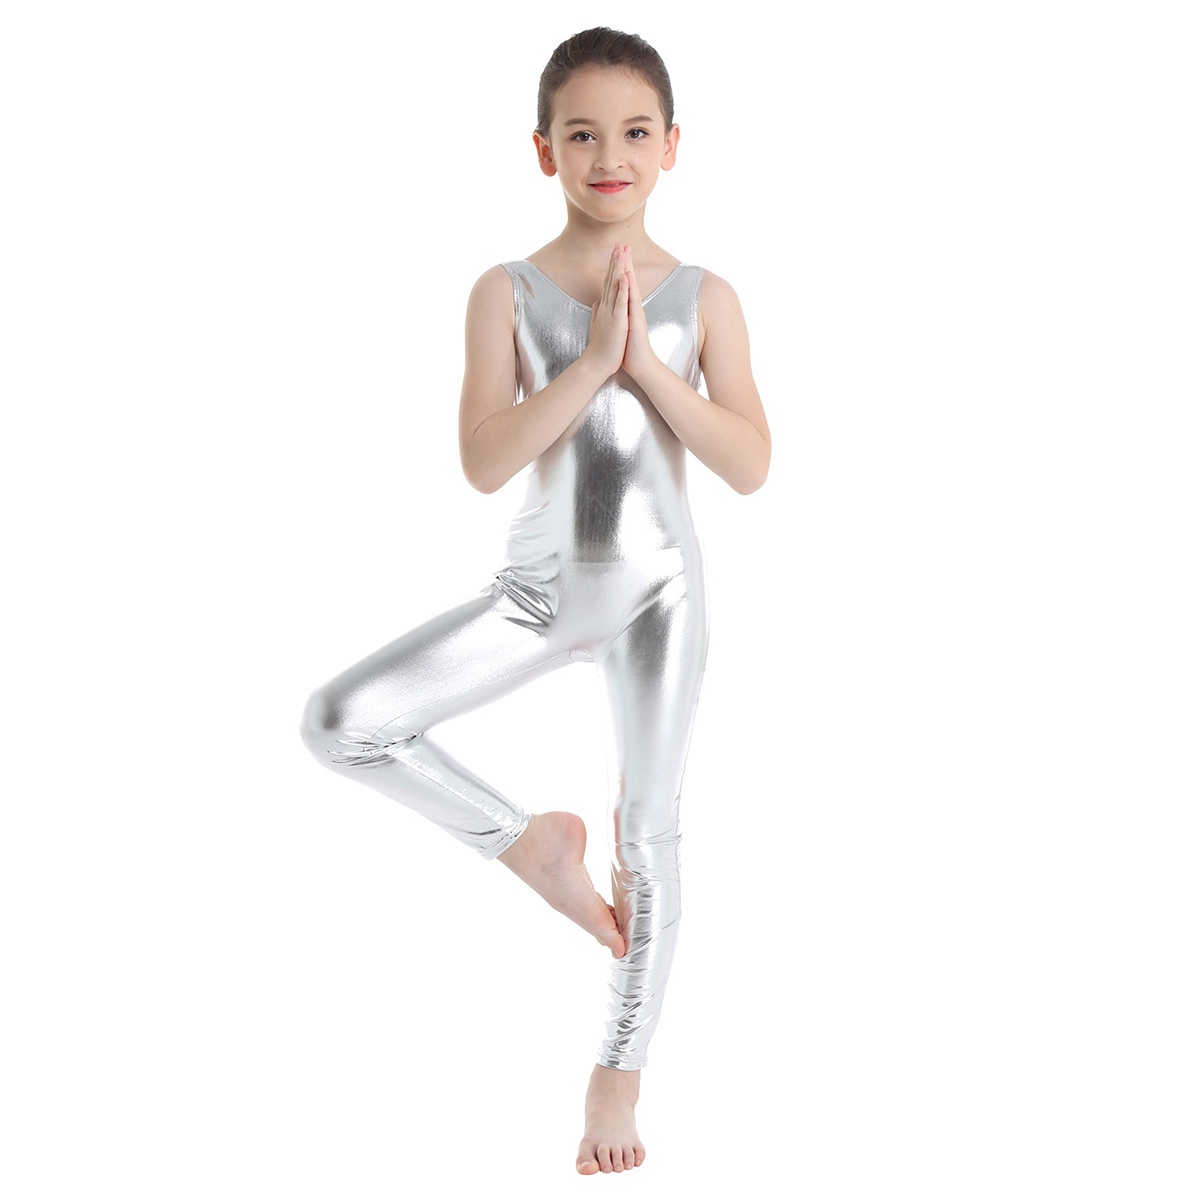 Kids Dancewear Girls Sleeveless Glossy Leotard Shiny Ballet Gymnastics Leotard Jumpsuit Unitard Girl Ballerina Dance Costume